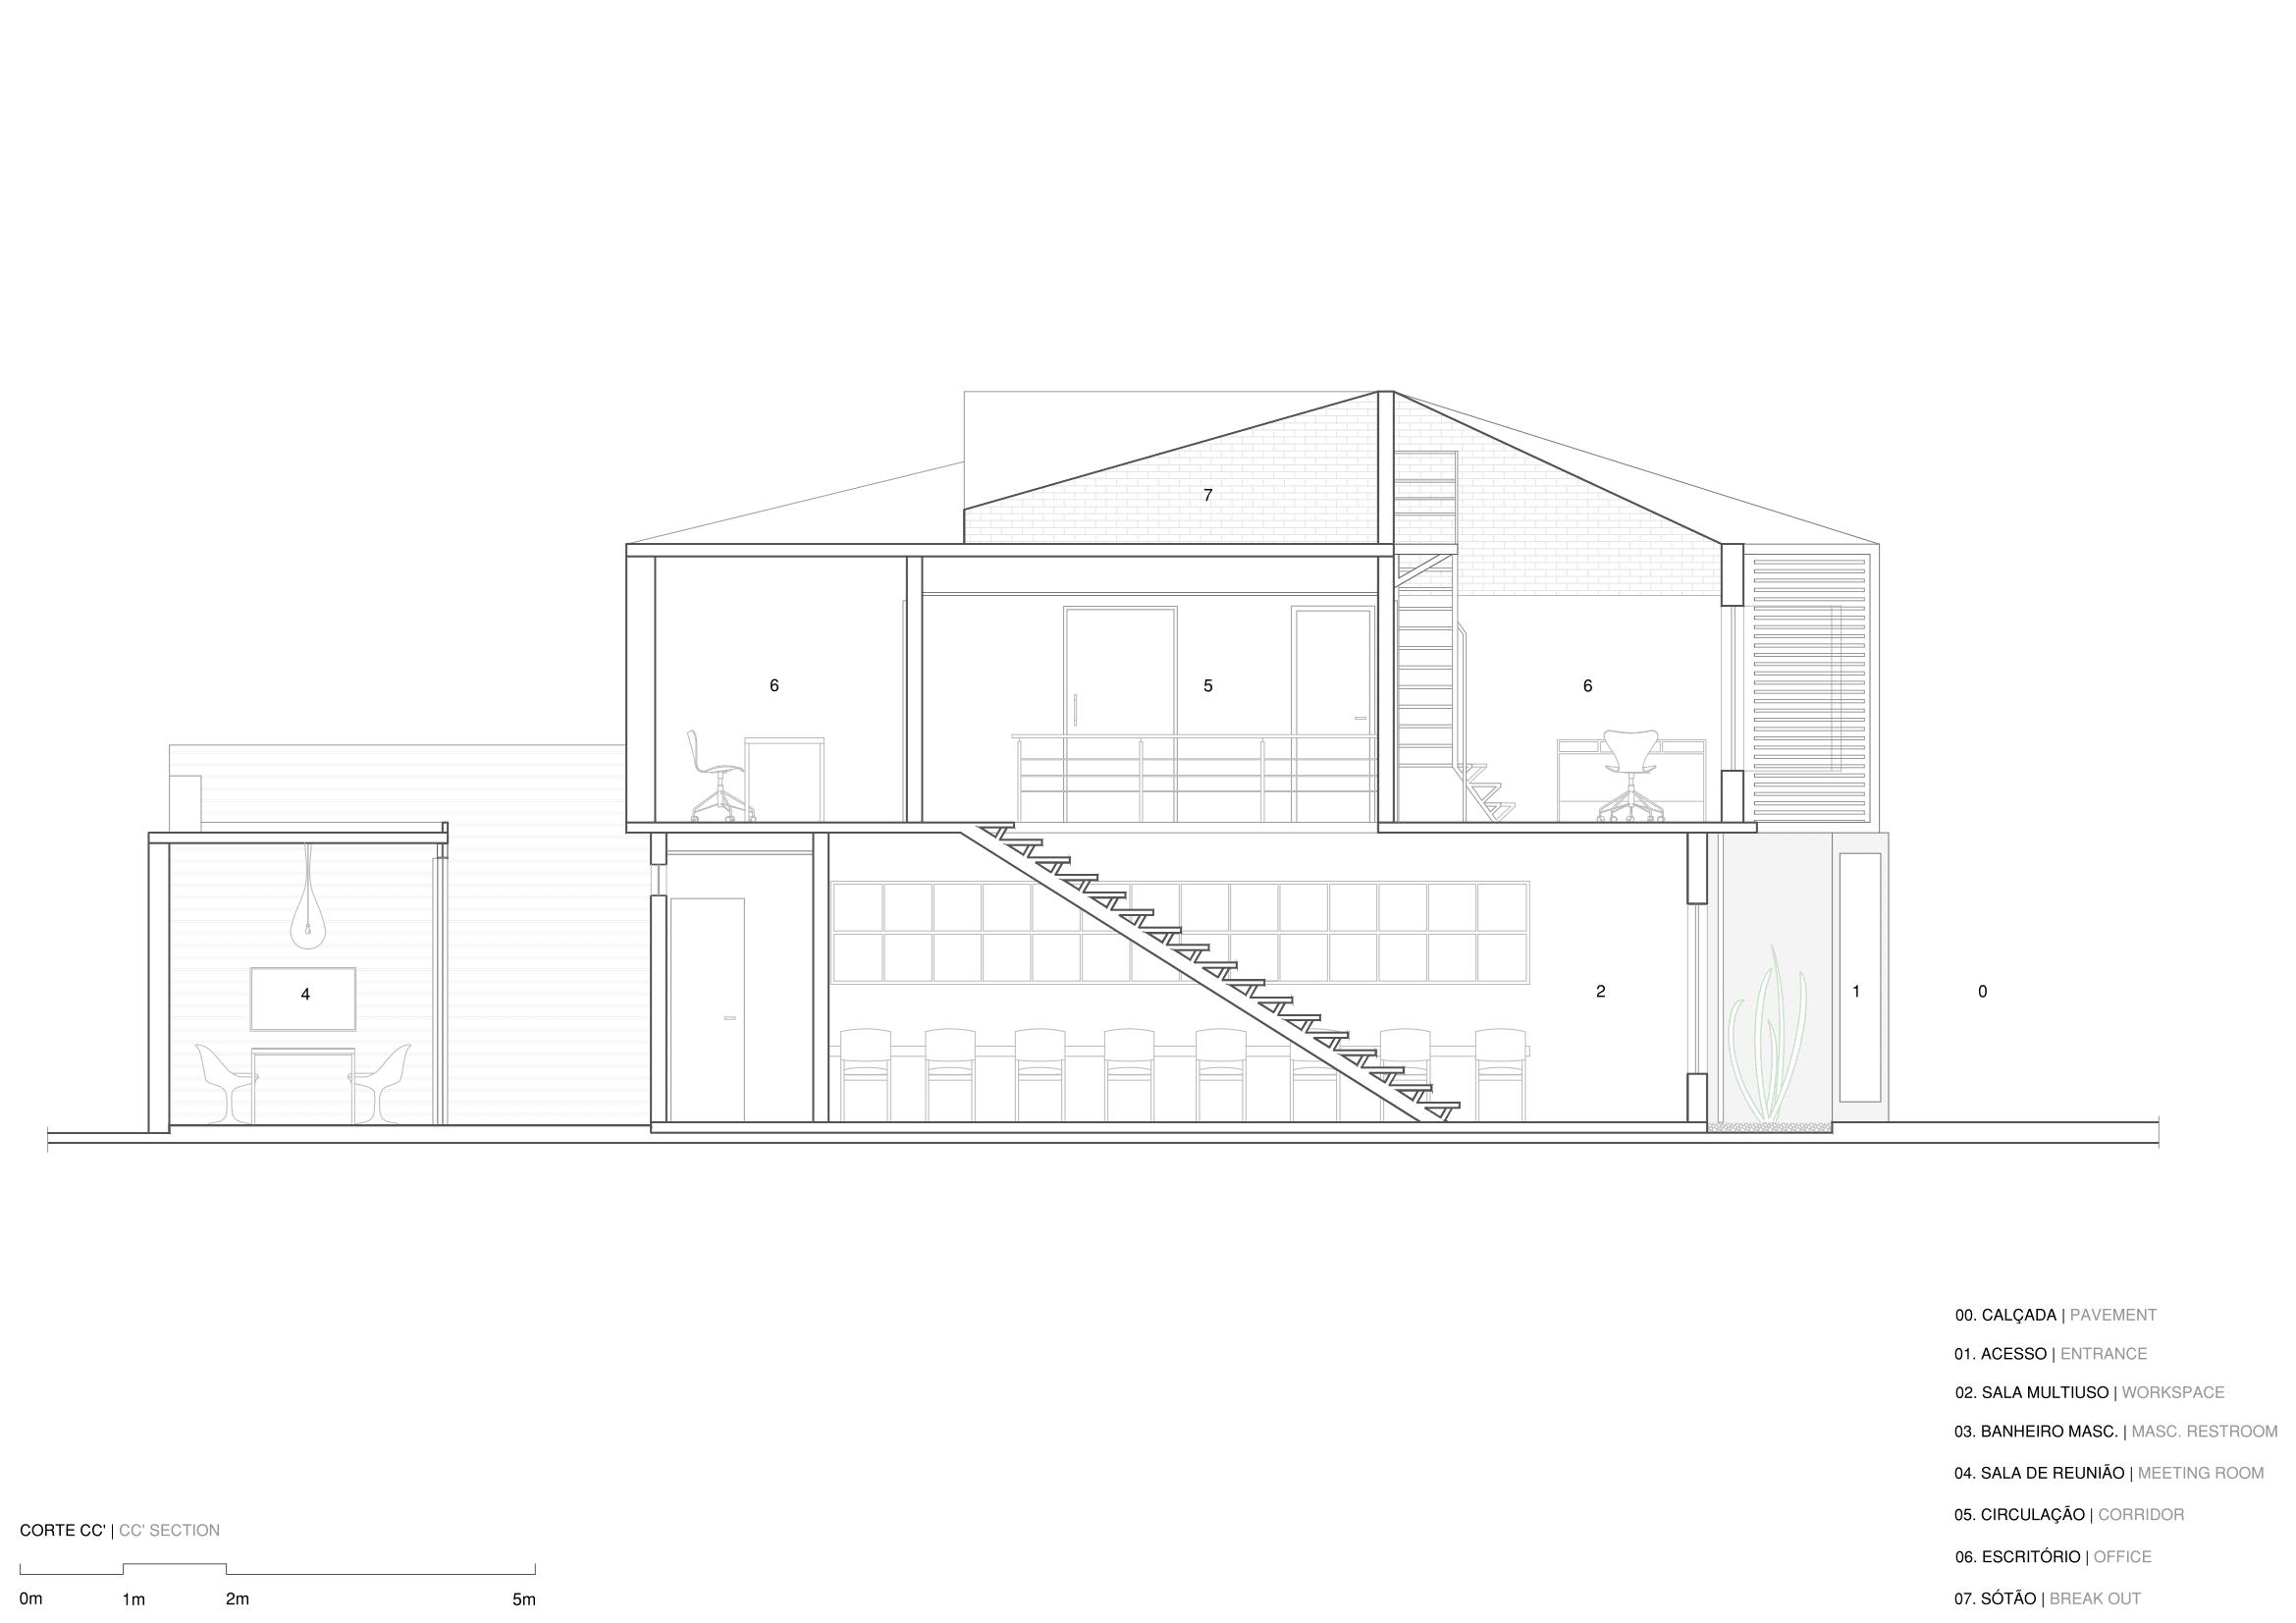 hobjeto-arquitetura-produtora-velloni-ap-06-cortecc